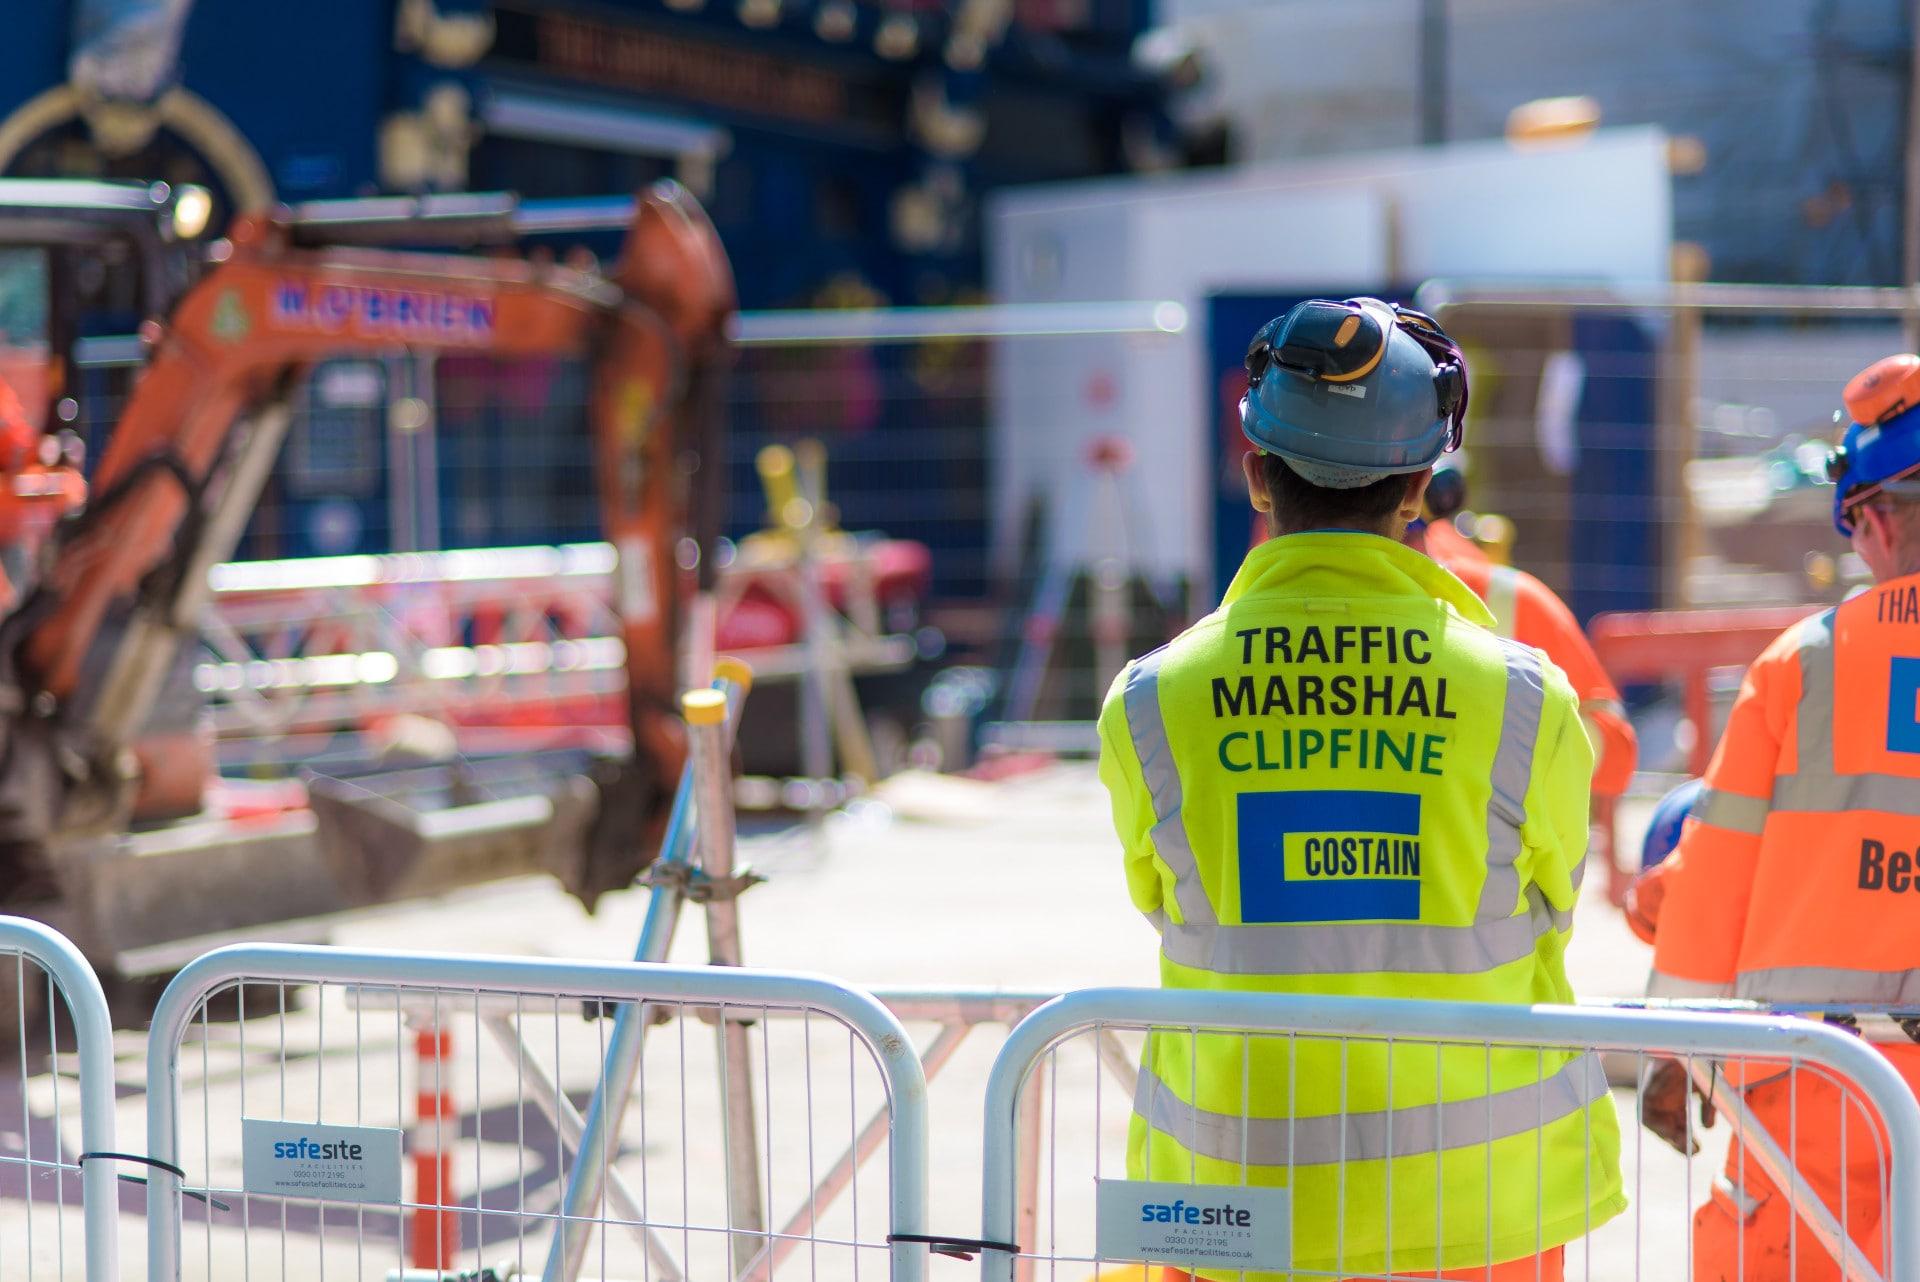 construction site traffic marshal